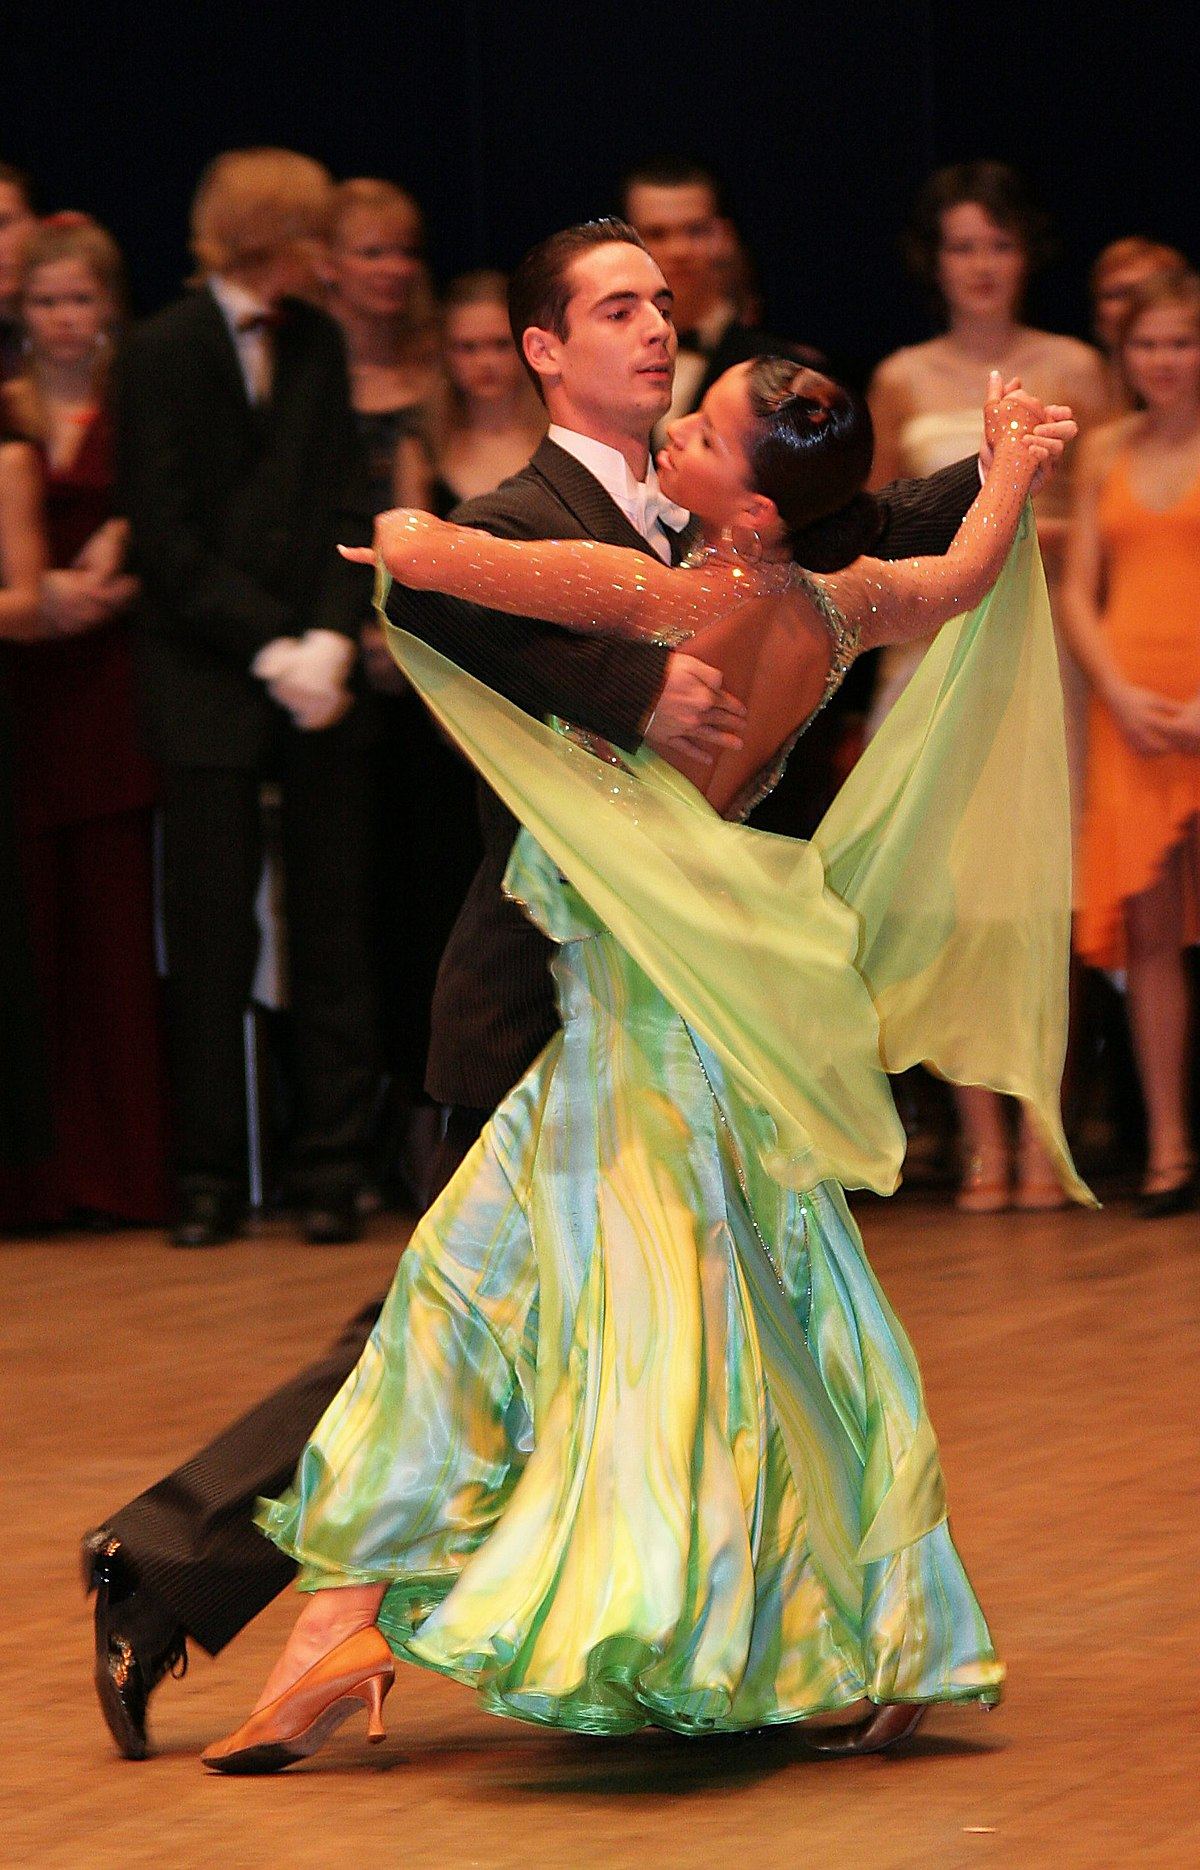 dance - Wiktionary